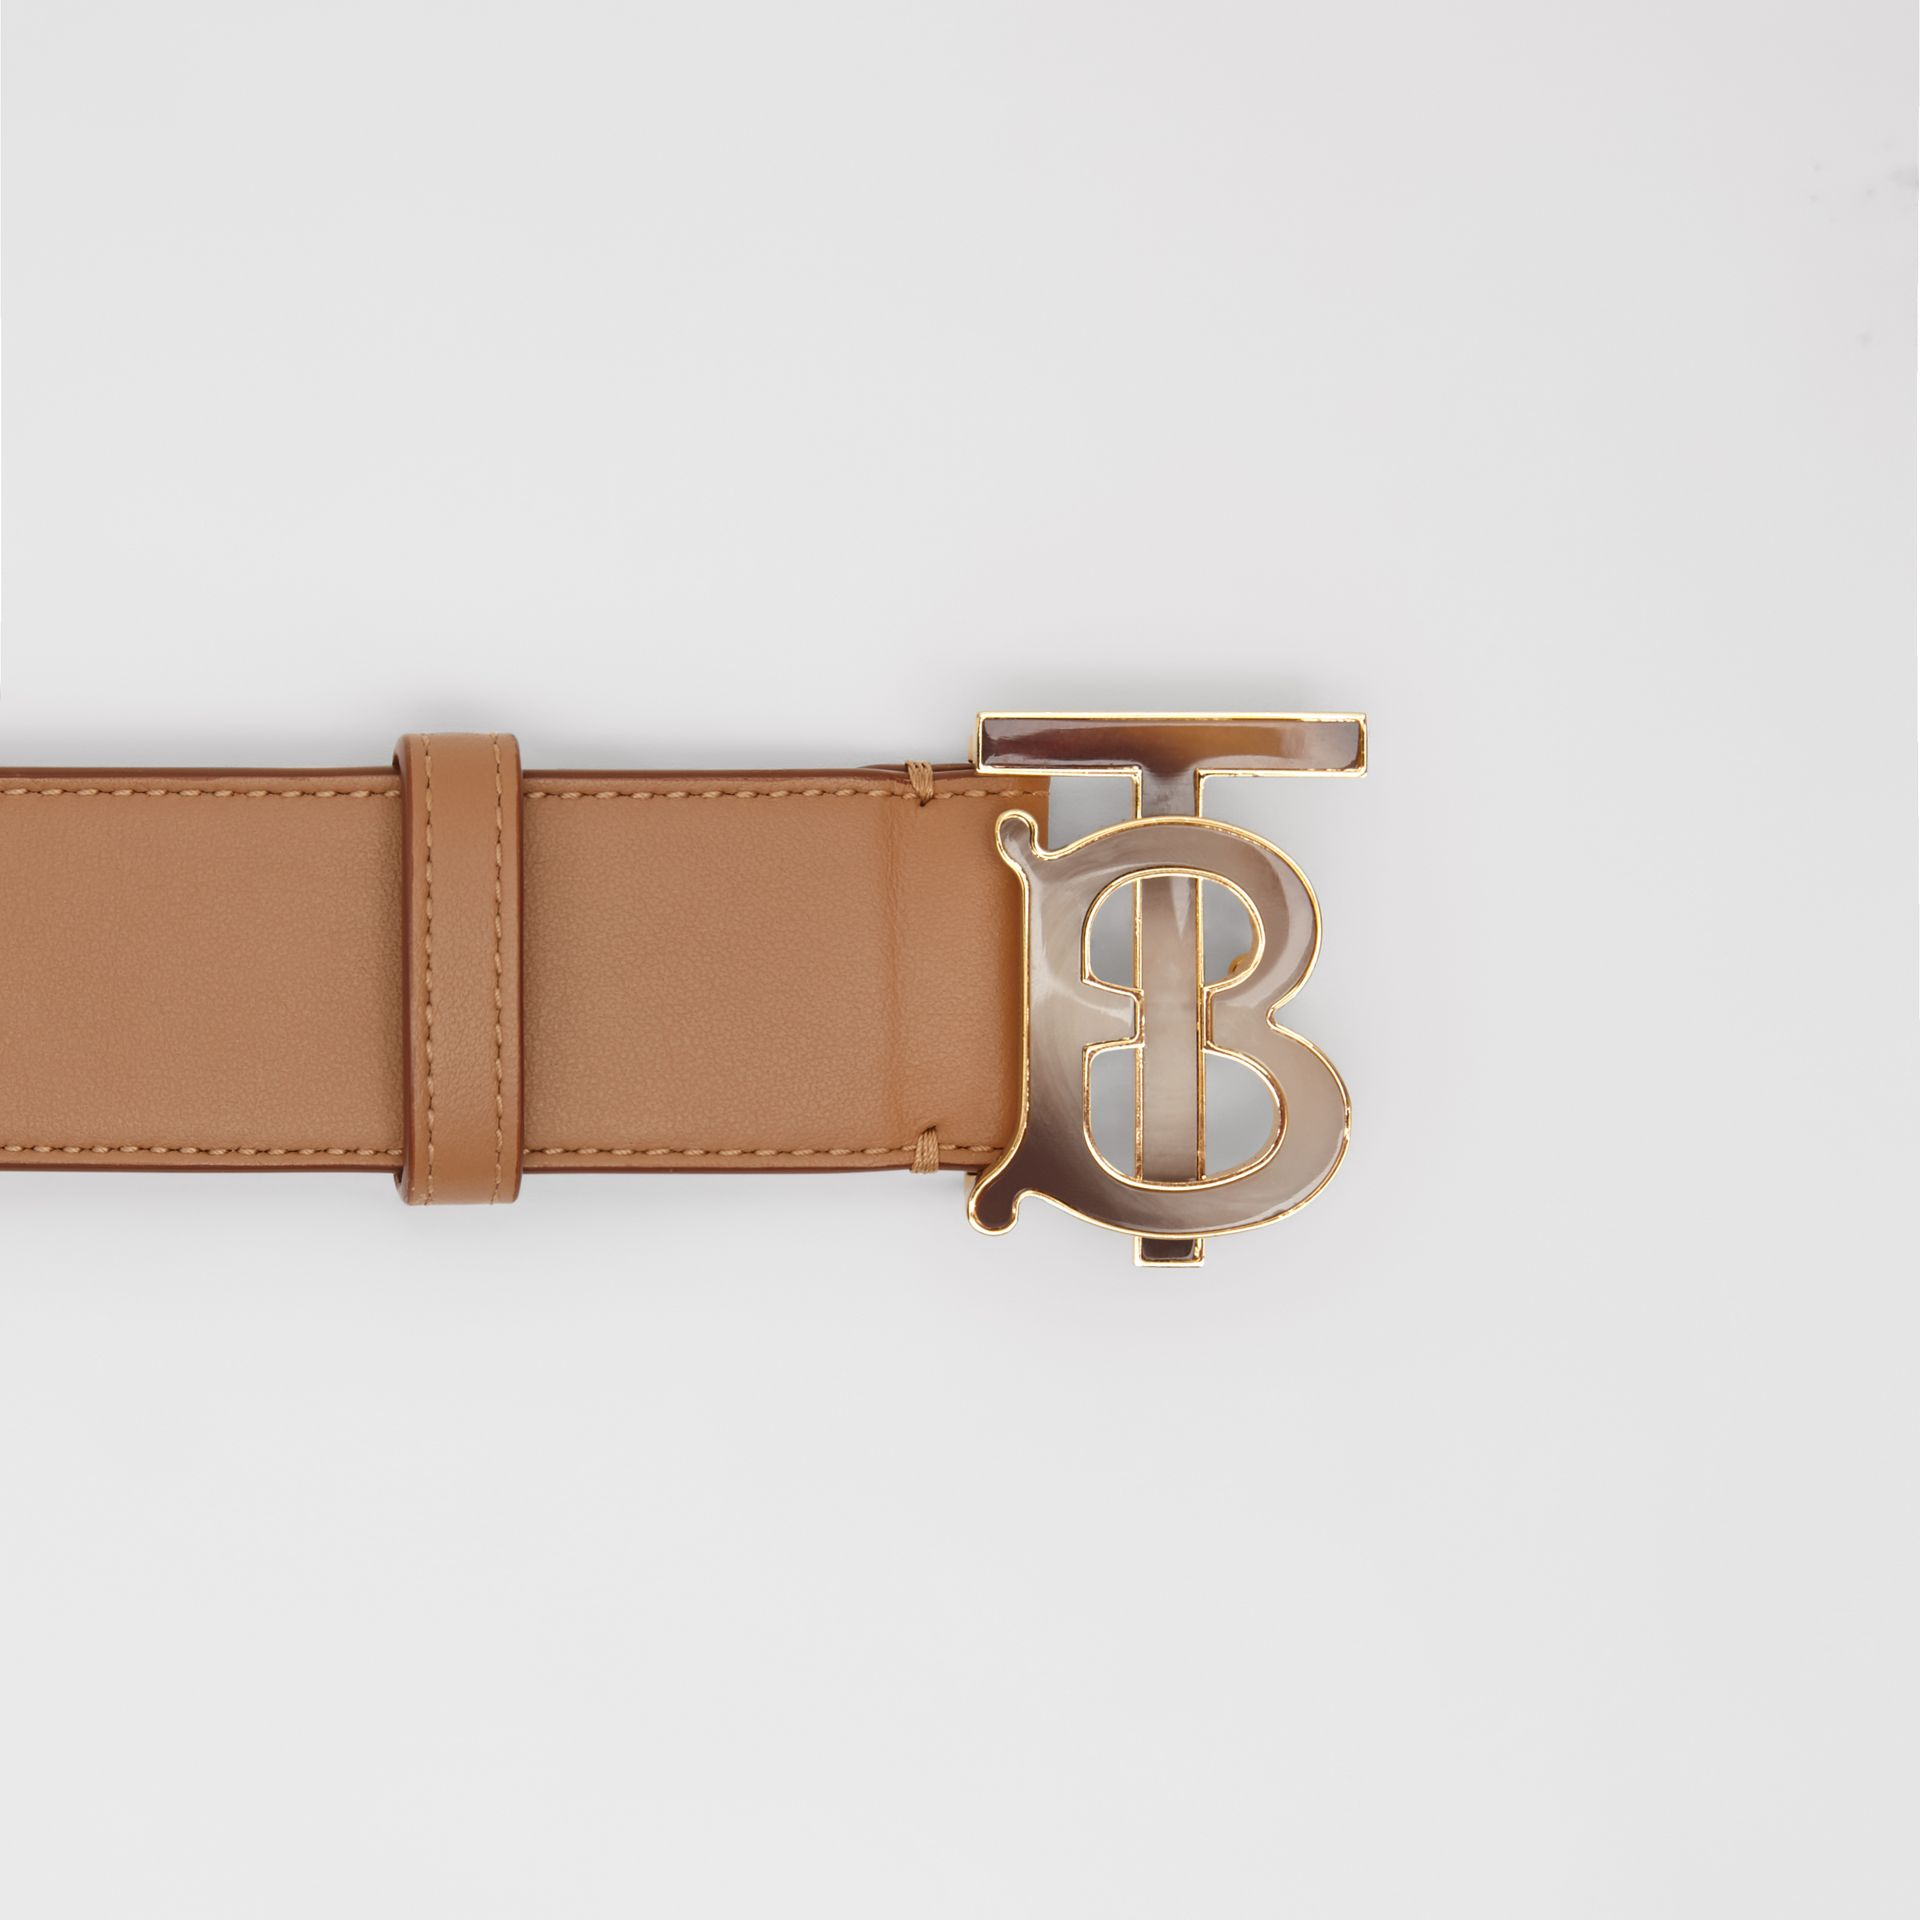 Monogram Motif Leather Belt in Light Camel - Women | Burberry United Kingdom - gallery image 1